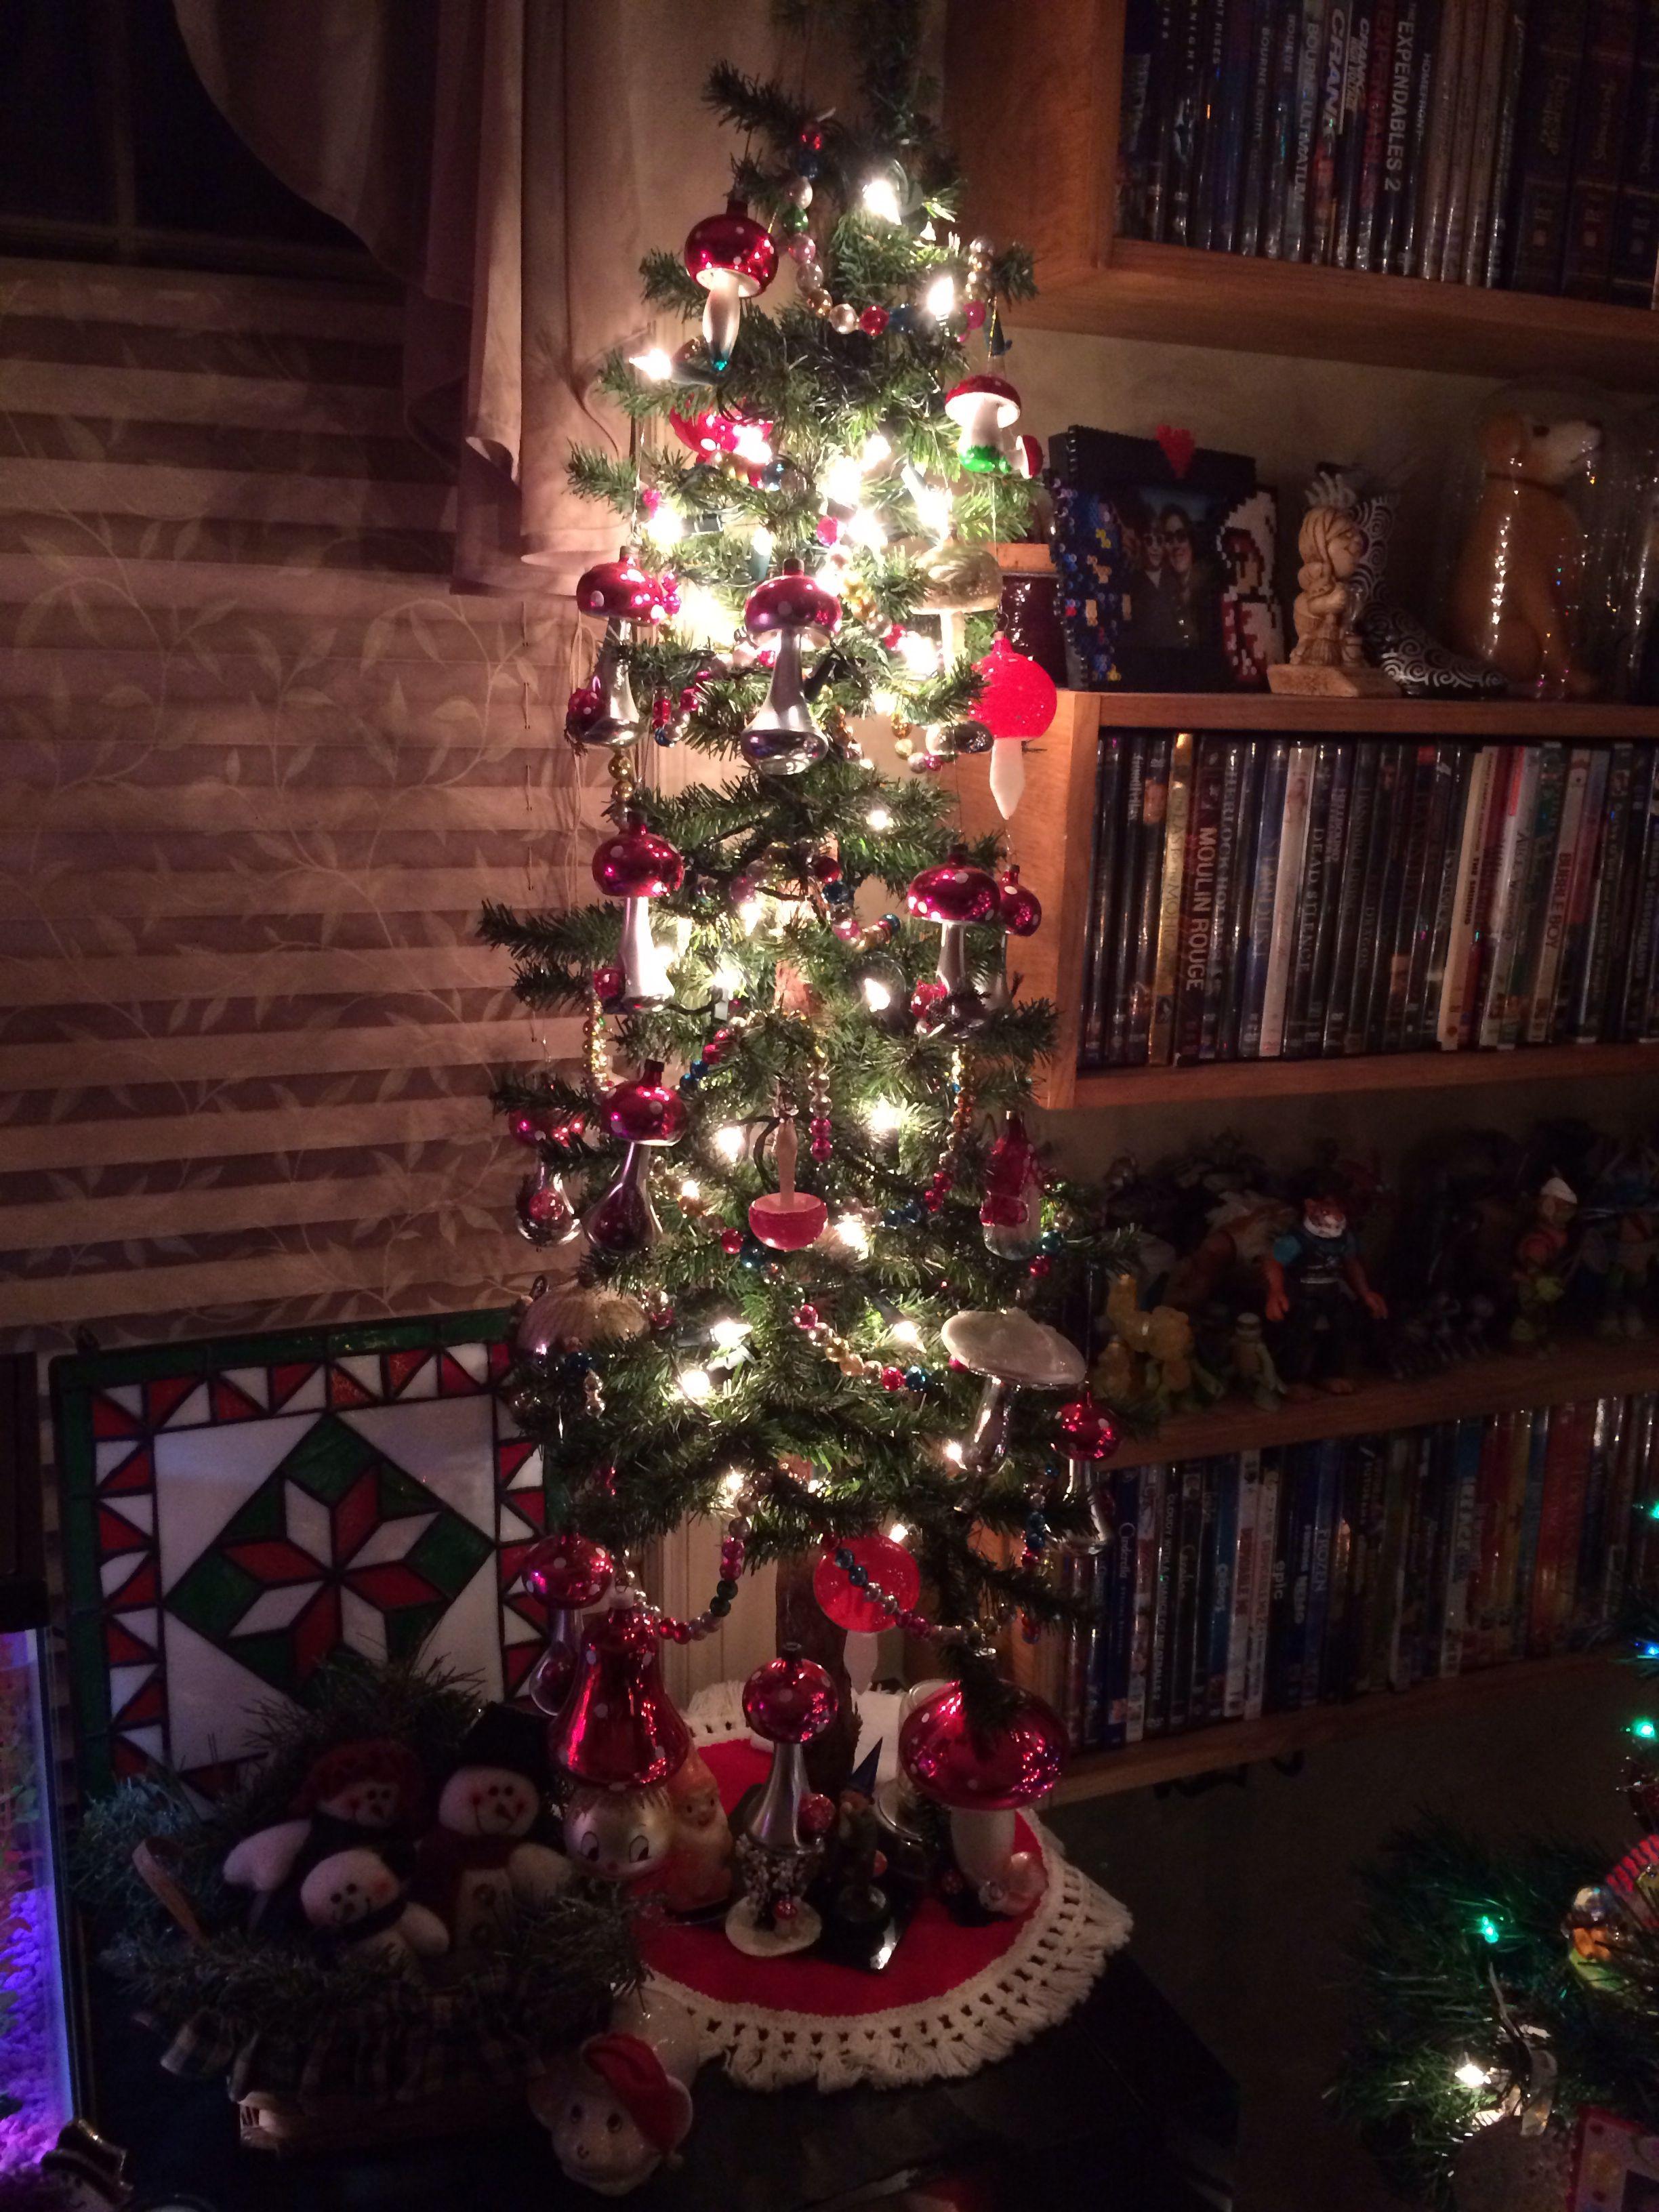 Our Vintage Toadstool Christmas Tree (One of My Pride & Joys)